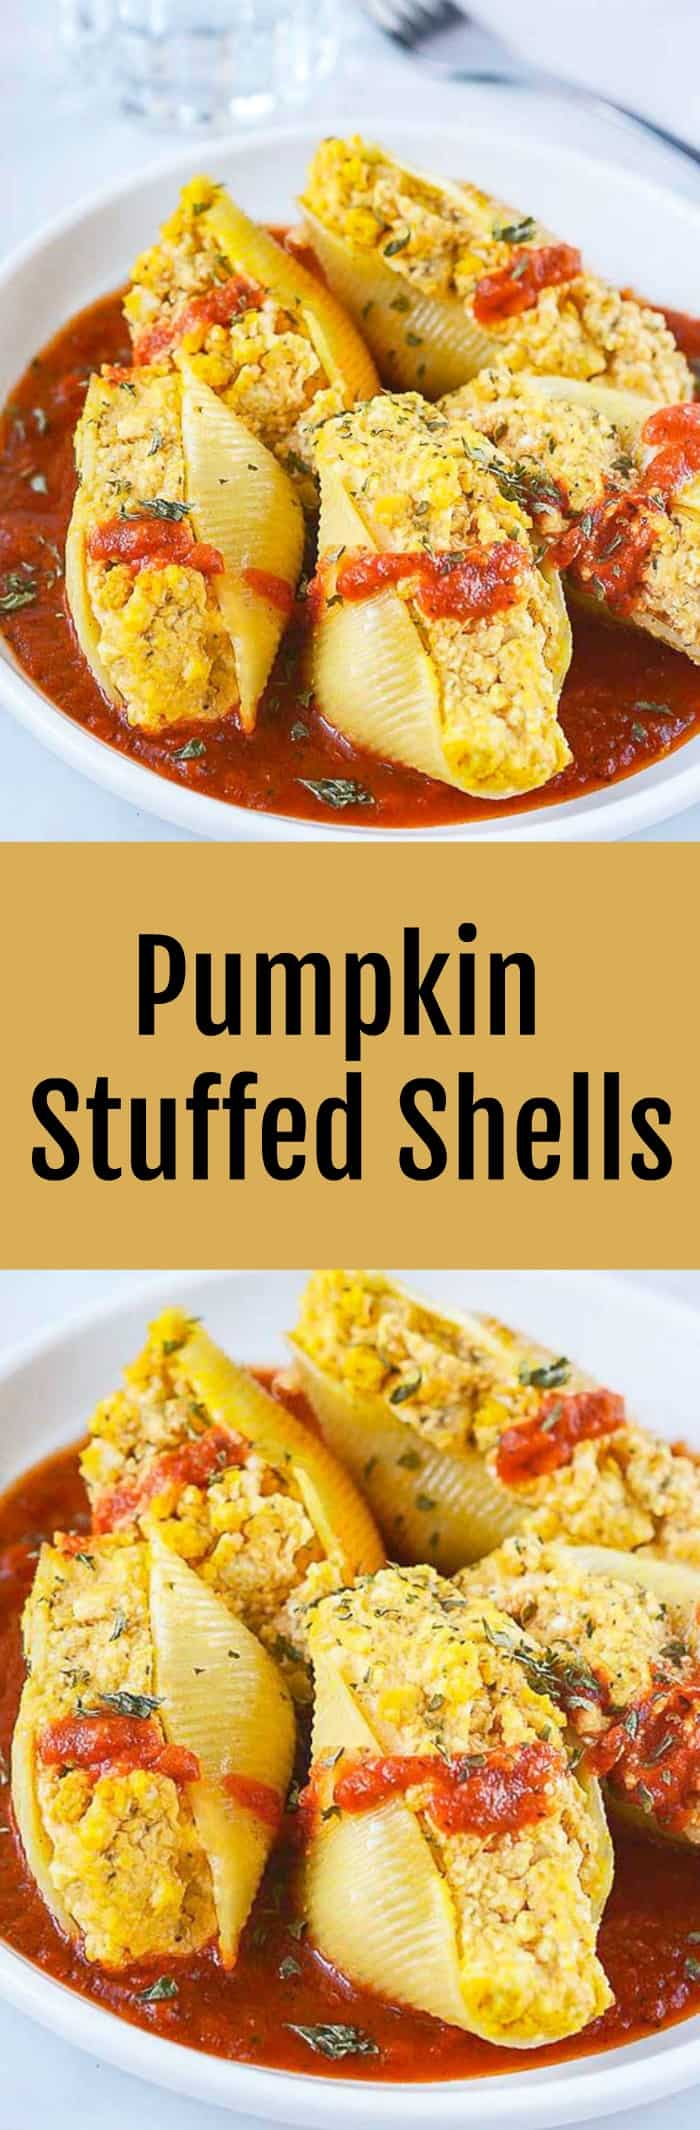 Pumpkin Stuffed Shells